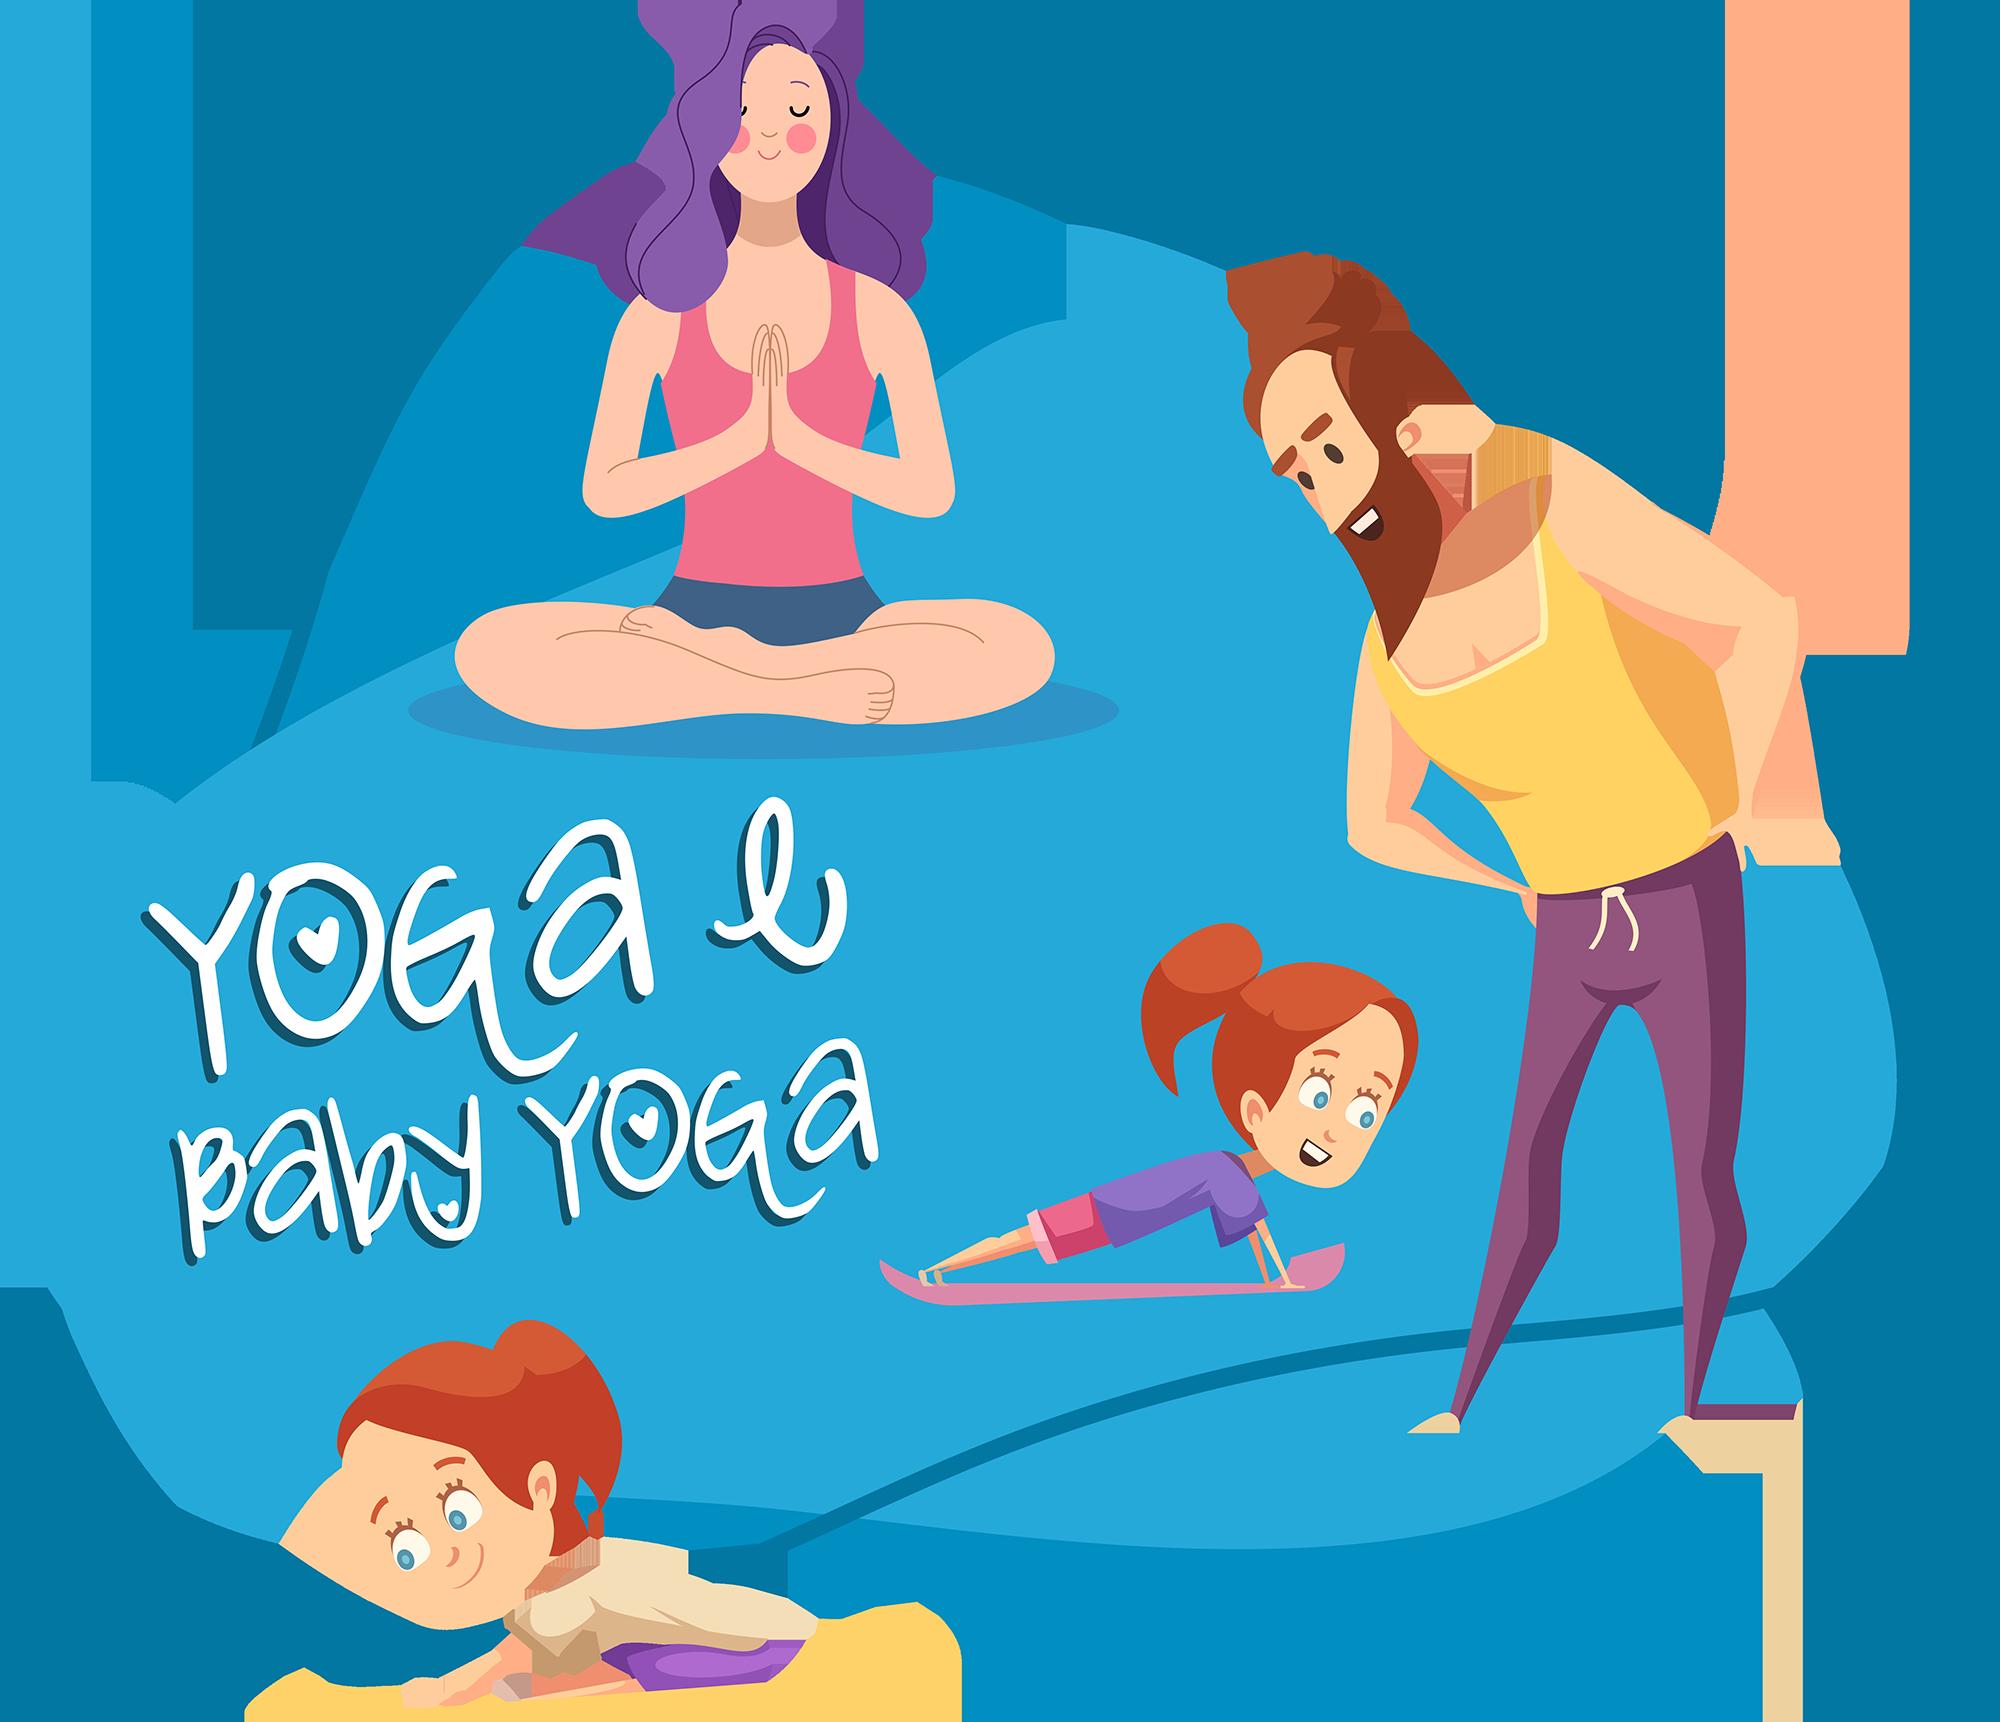 Yoga e baby yoga